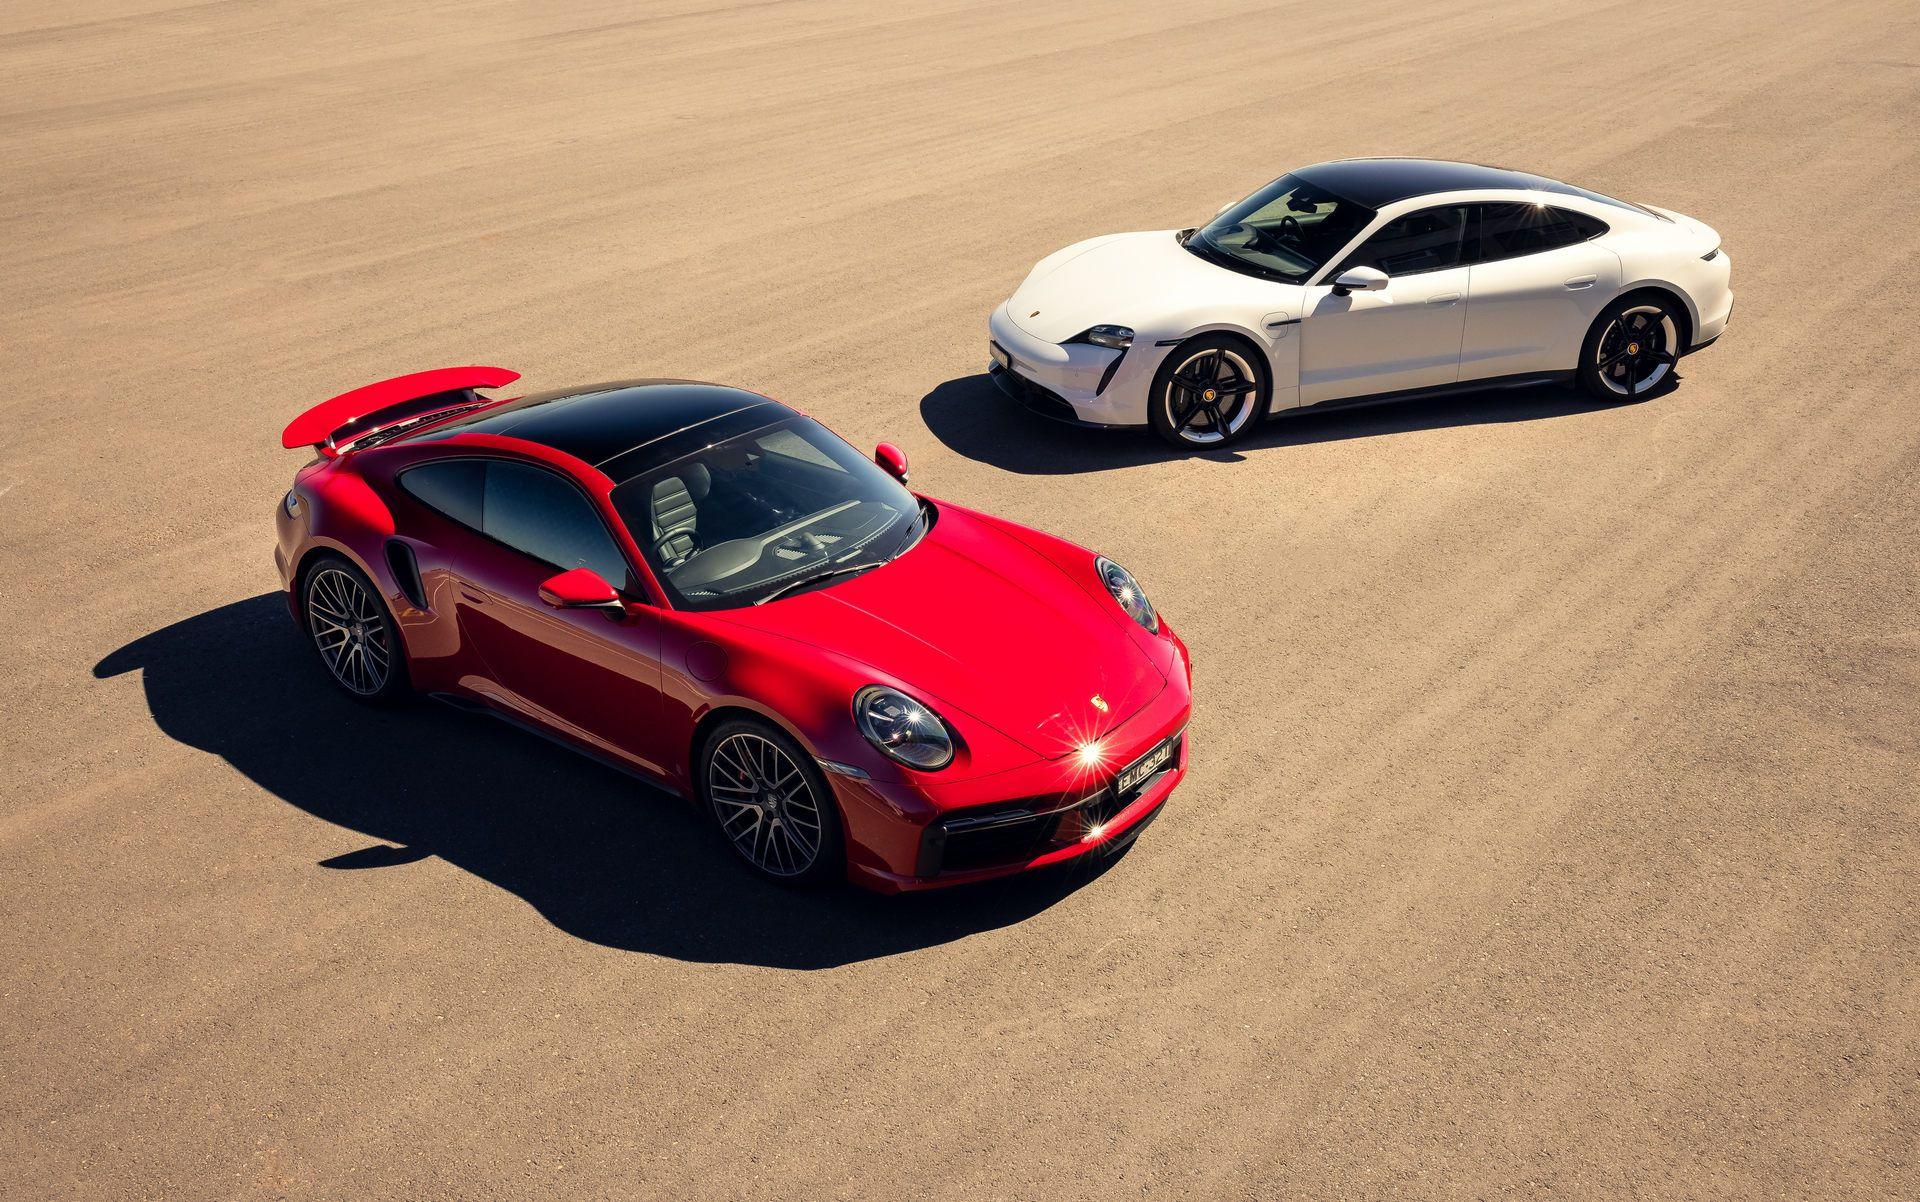 Porsche-Taycan-Turbo-S-The-Bend-Motorsport-Park-50